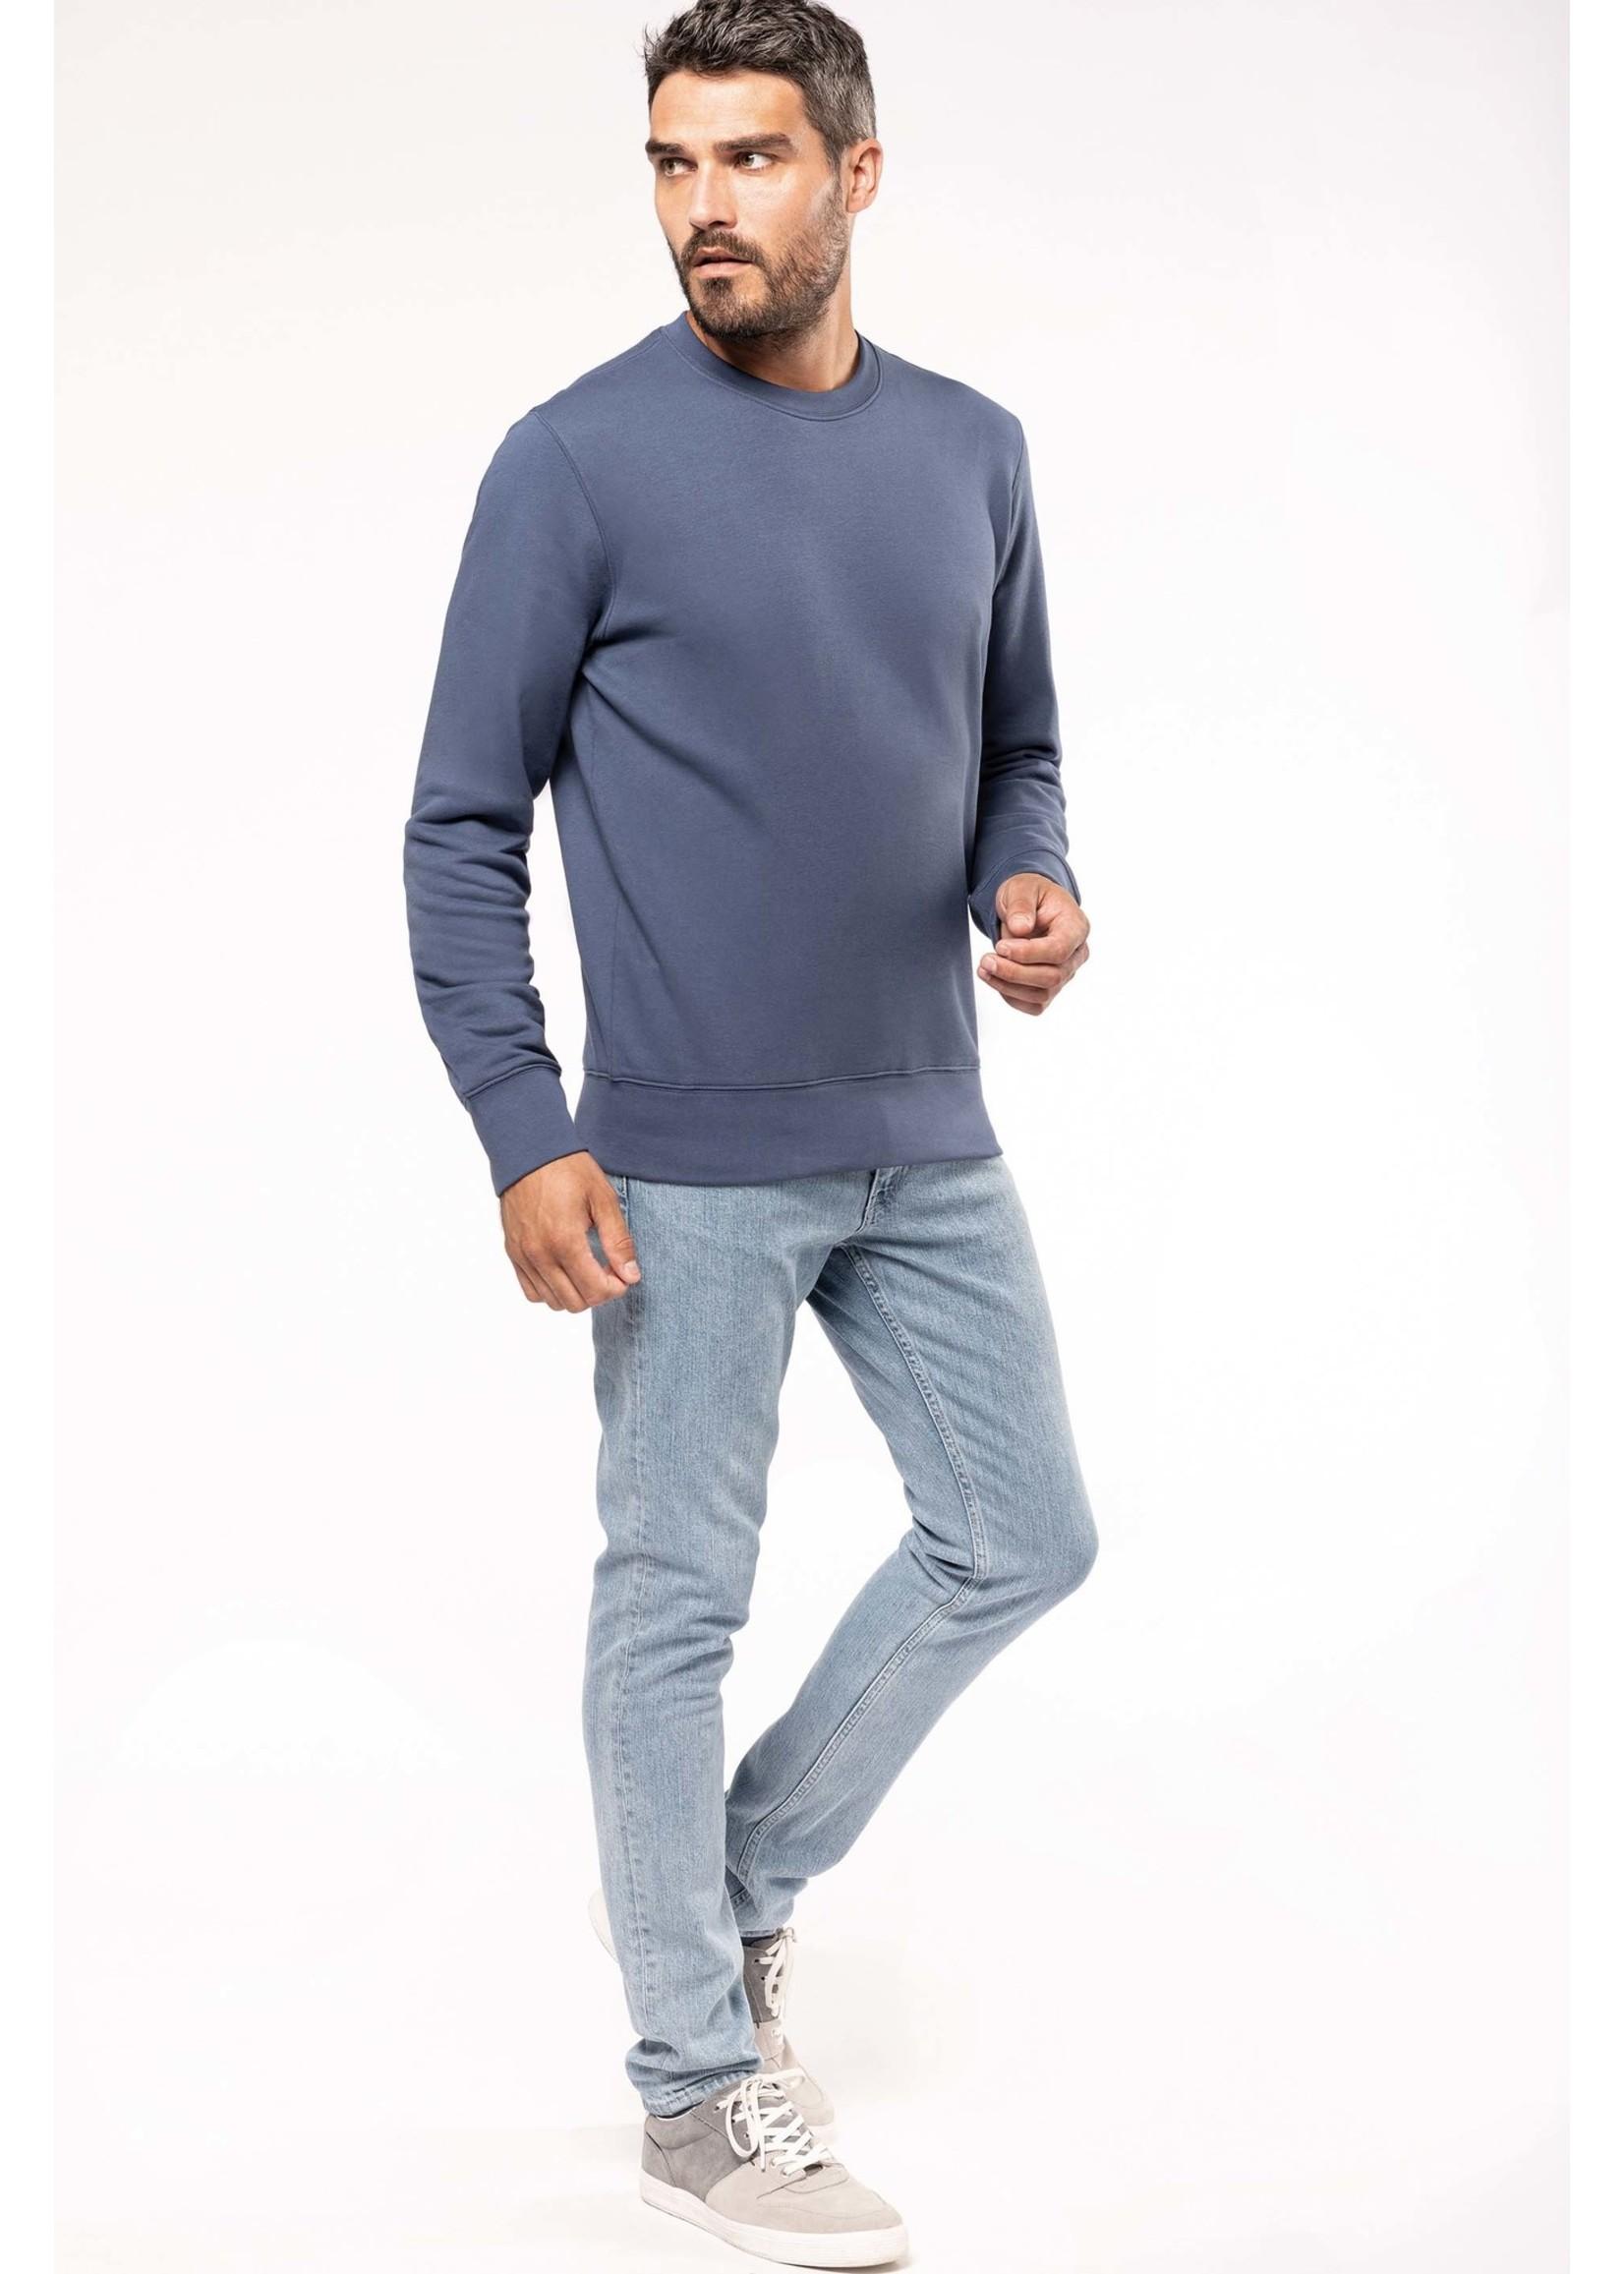 Eco-Friendly Sweater UNI Ice Mint